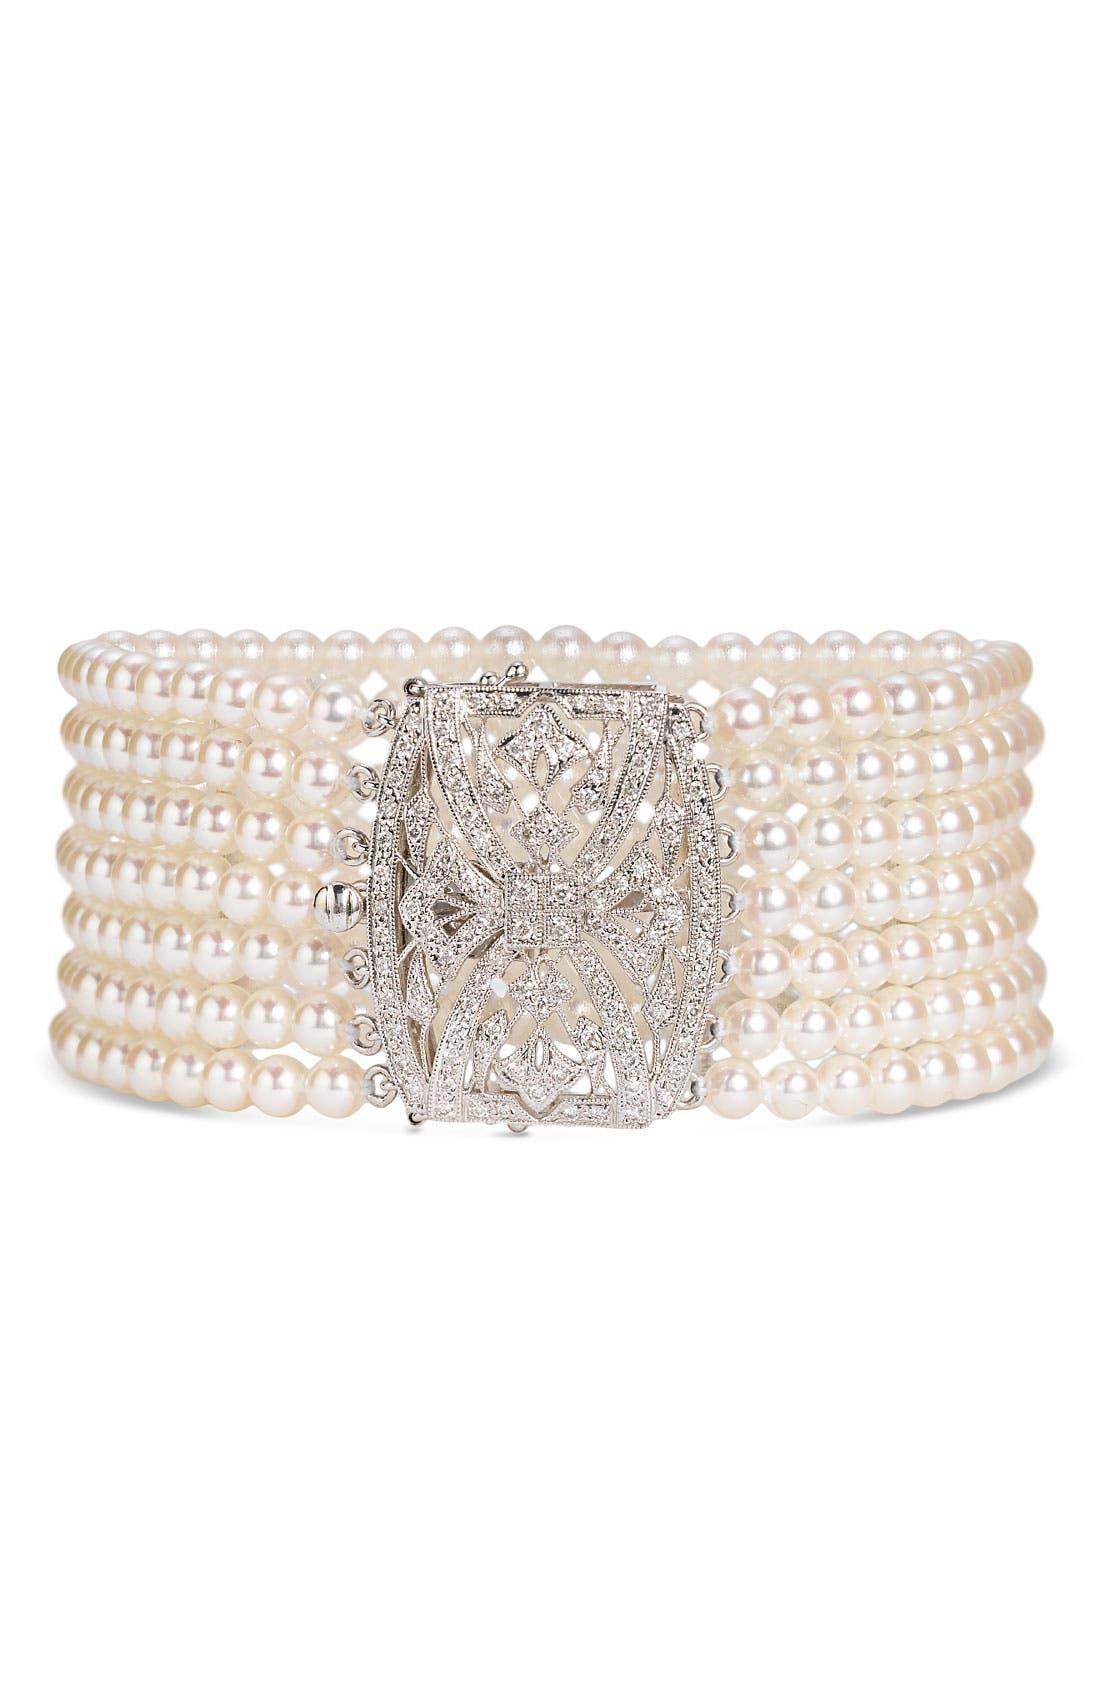 Main Image - Mastoloni 7-Strand Pearl & Diamond Clasp Bracelet